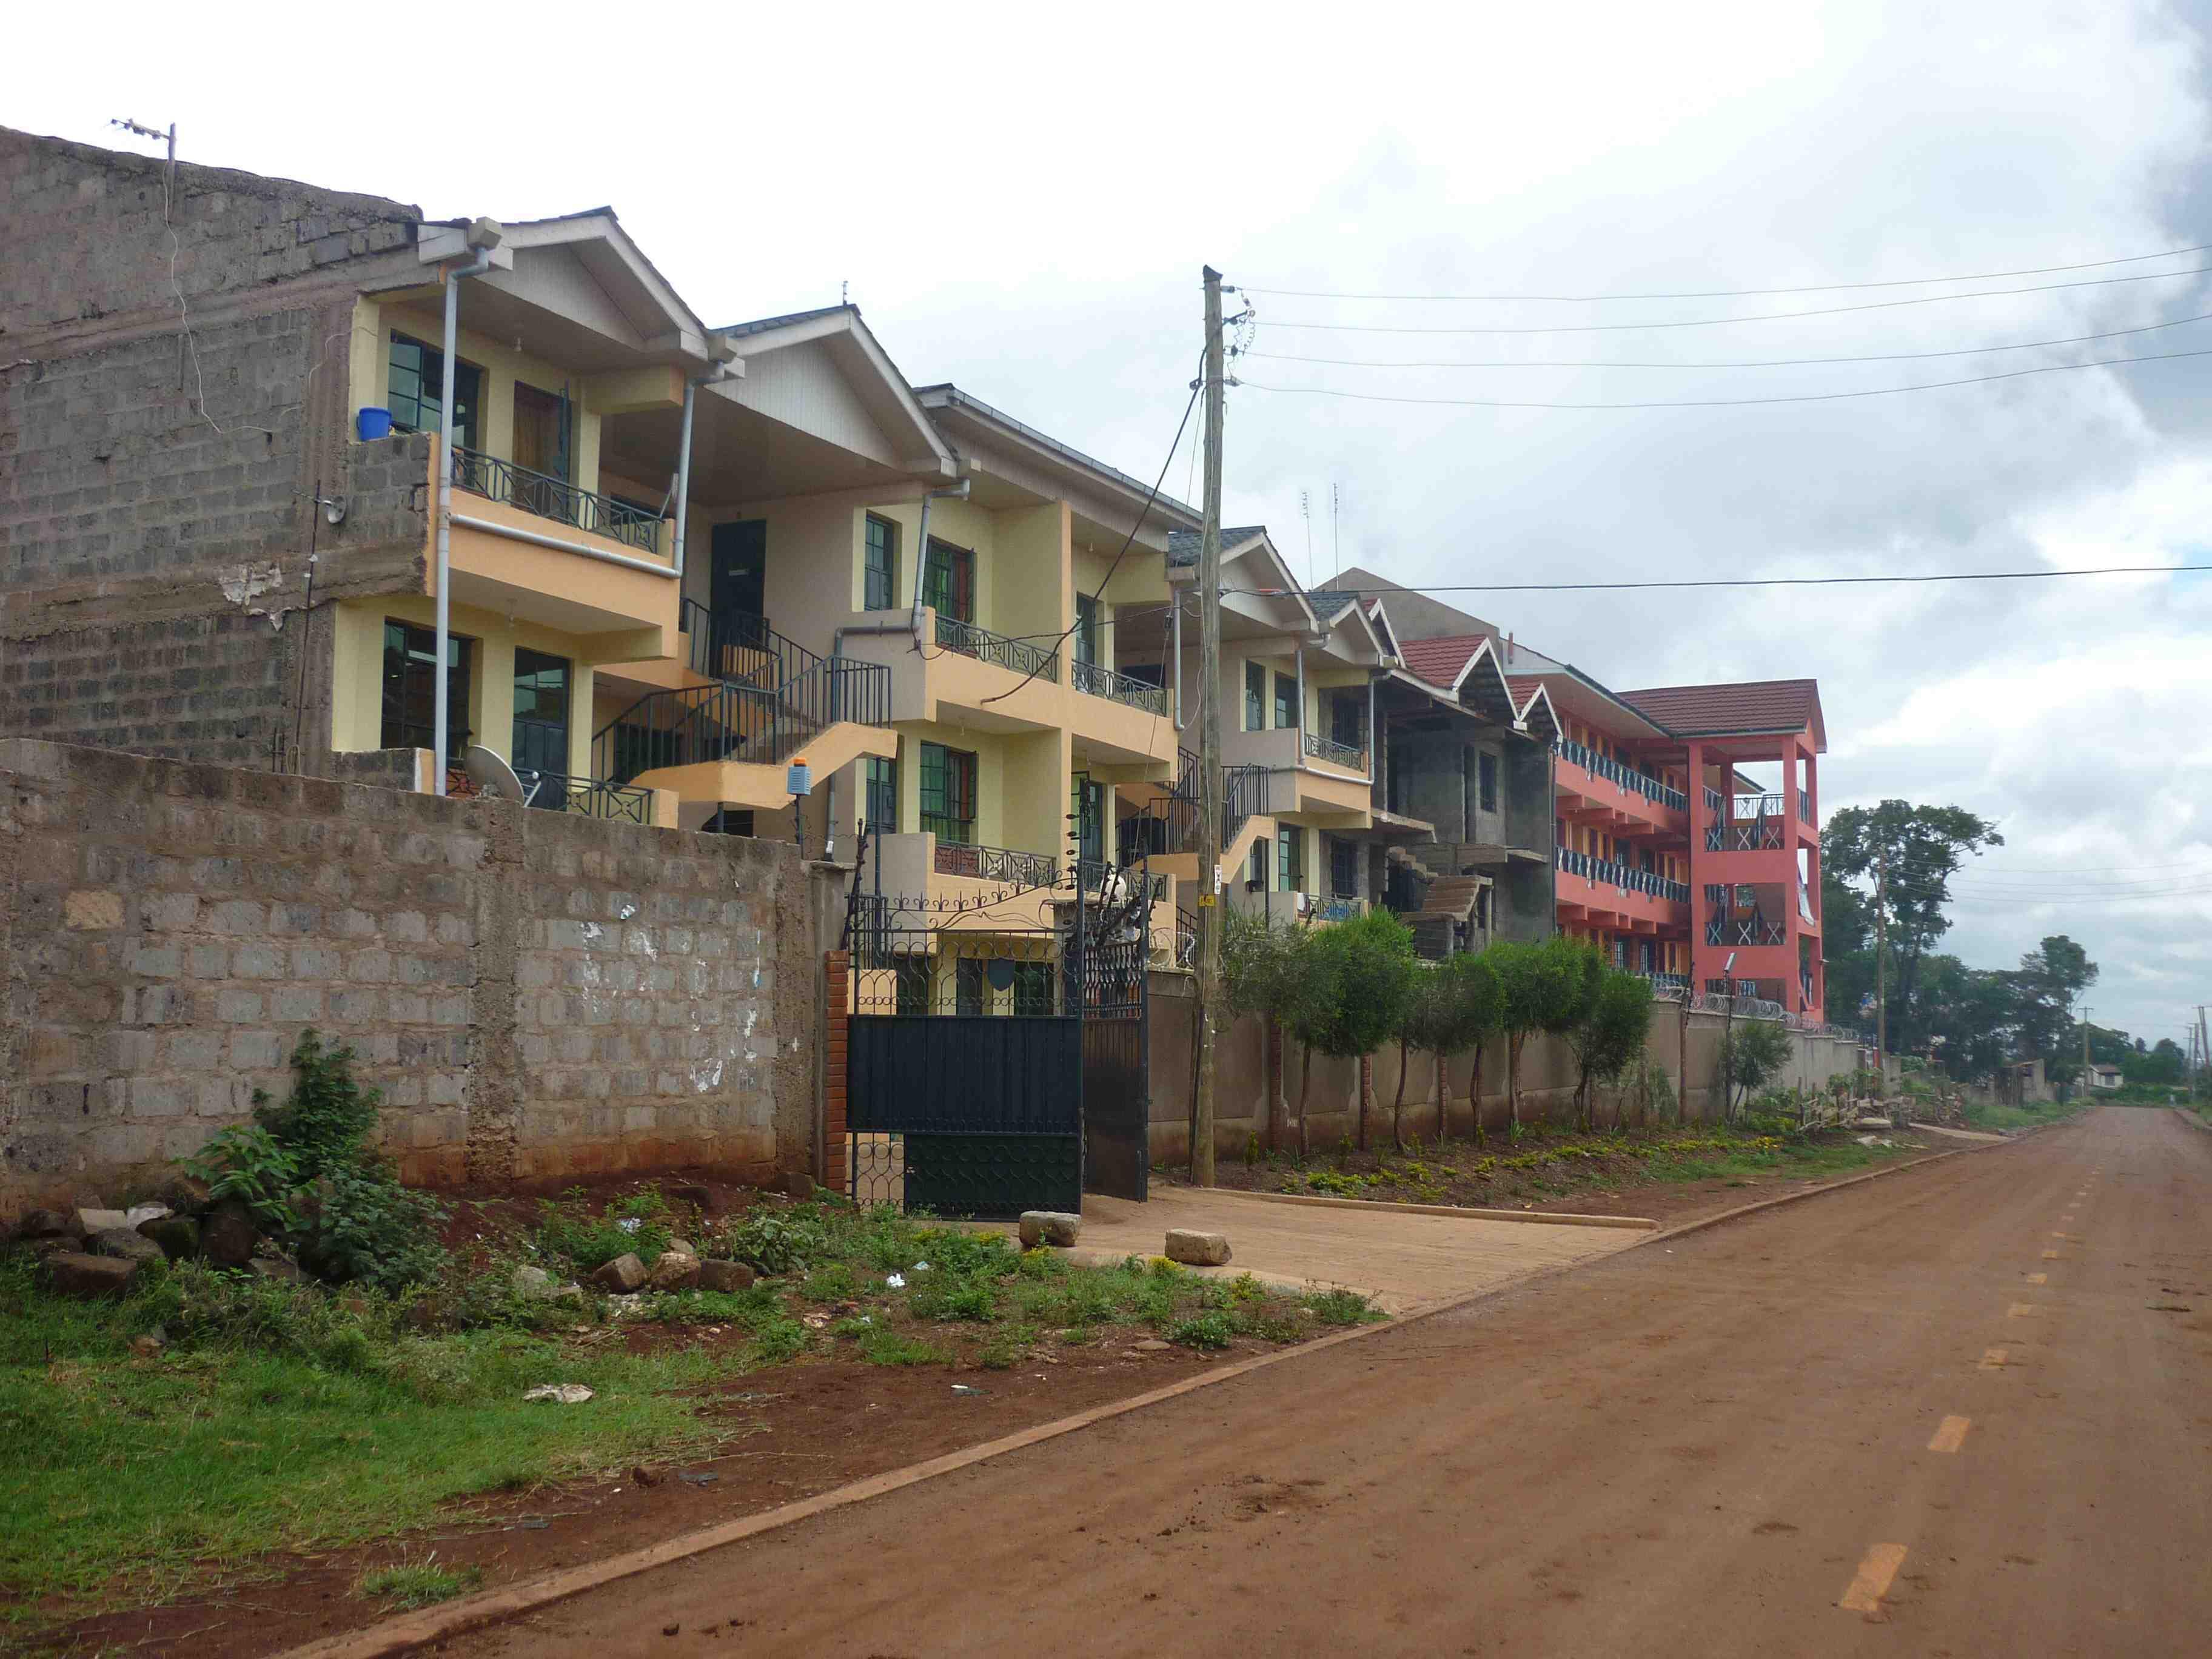 Ex-colonel Edward Loden shot dead by robber in Nairobi, Kenya ...